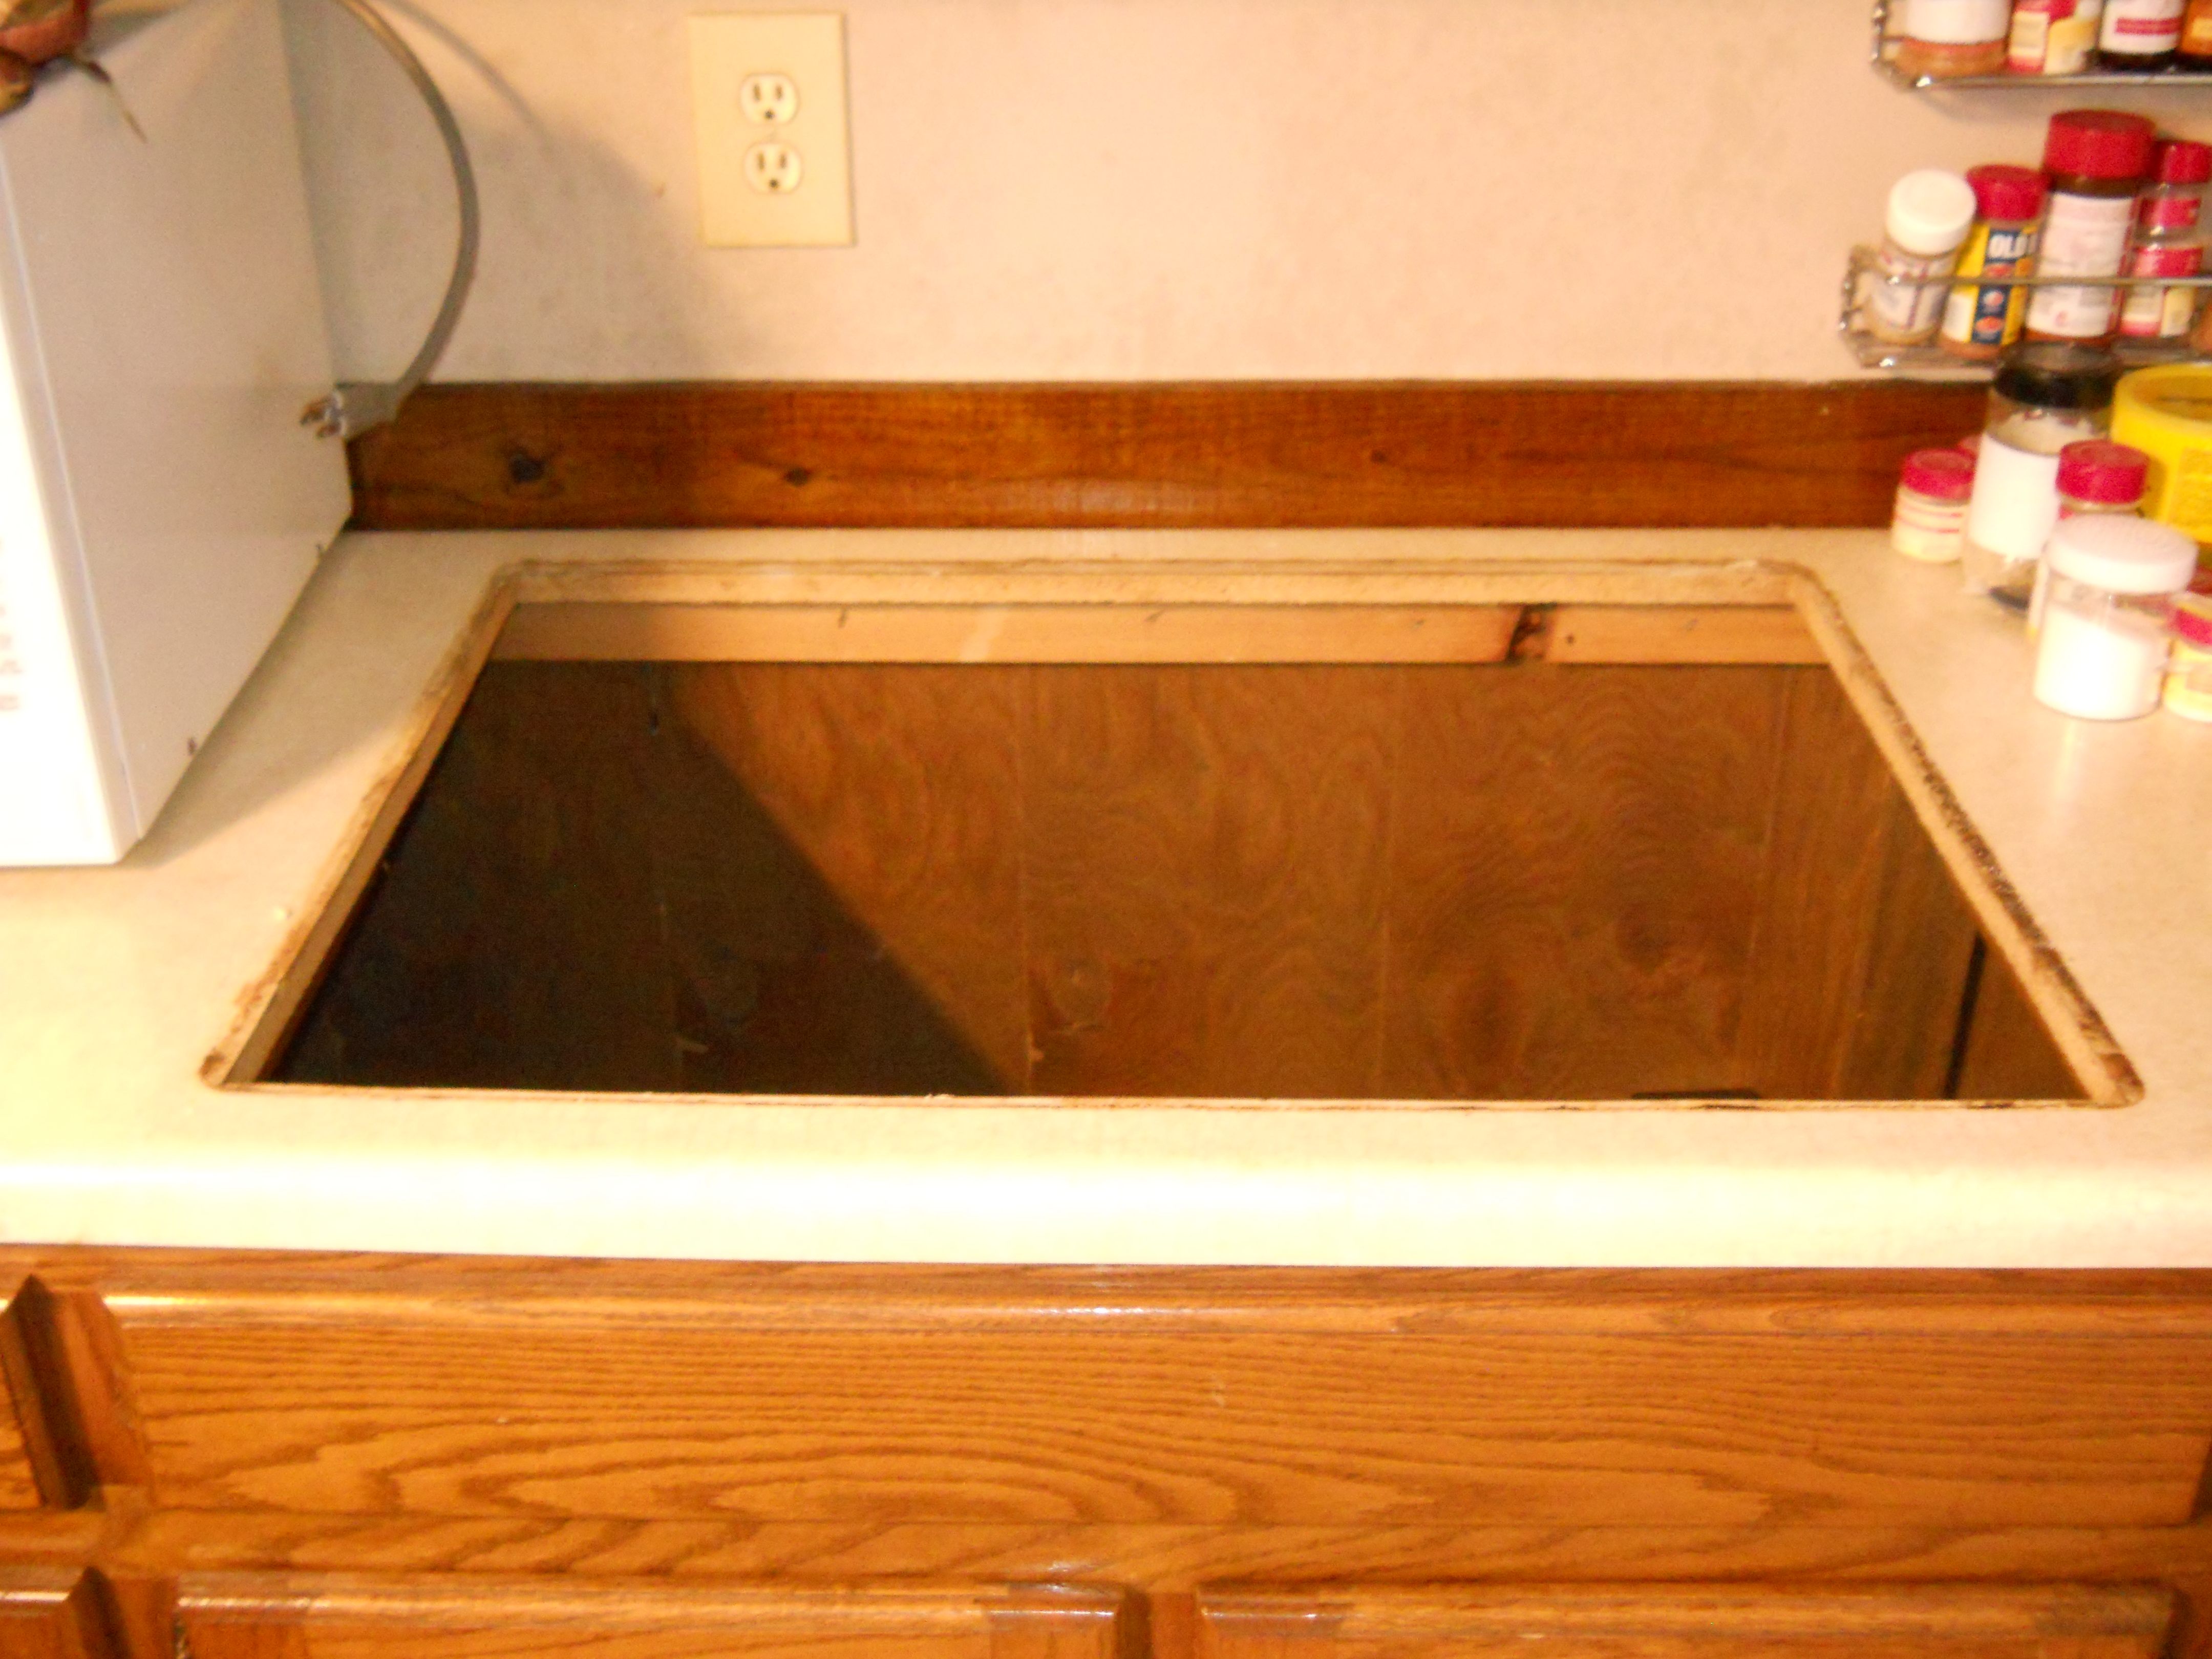 DIY: Repairing A Kitchen Counter